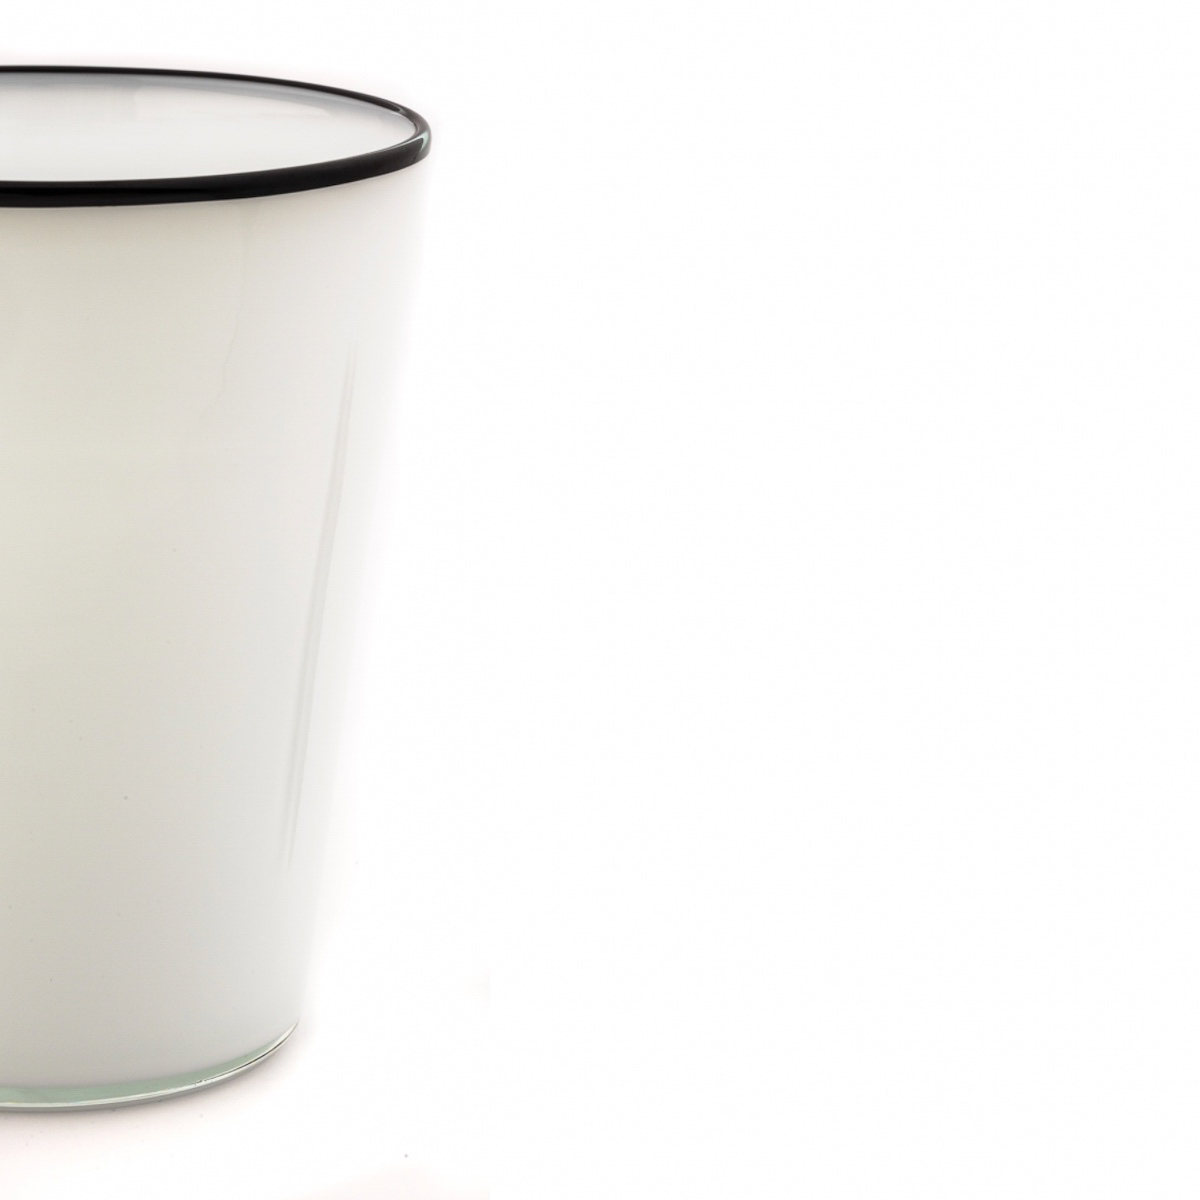 fontana-taglio-cut-white-knife-glass